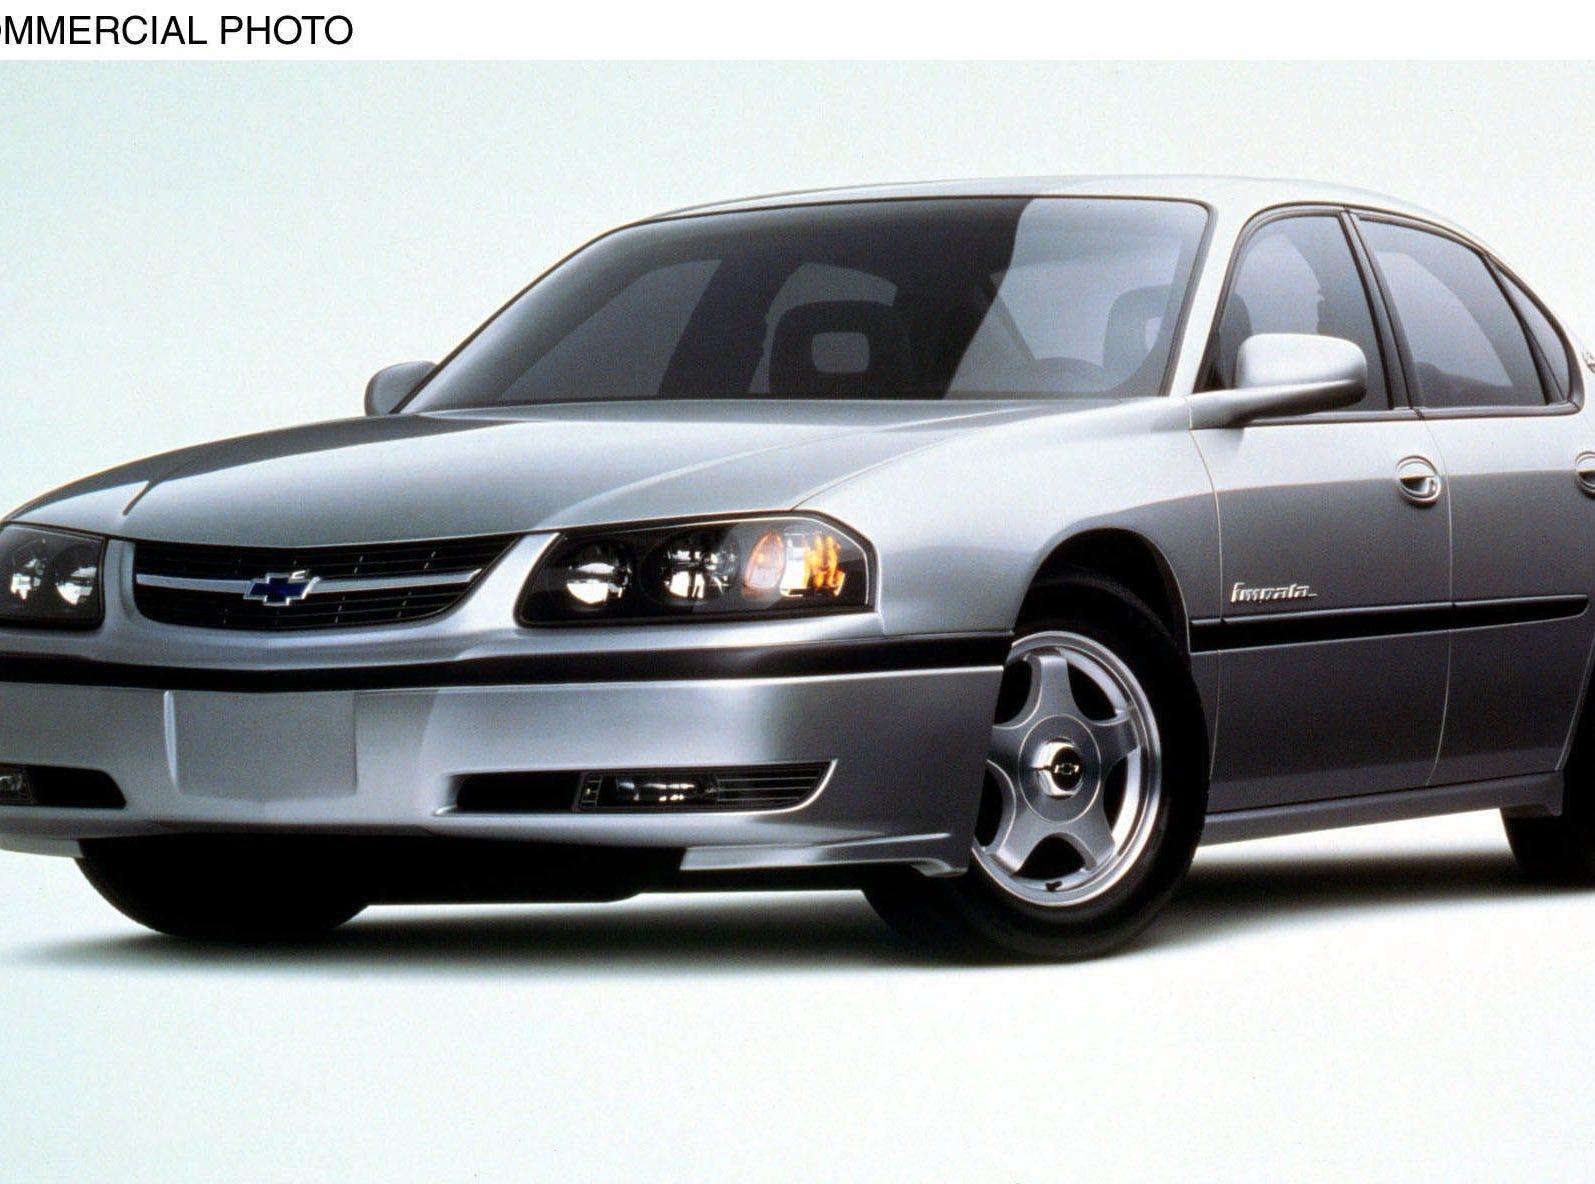 2000 Chevrolet Impala LS.